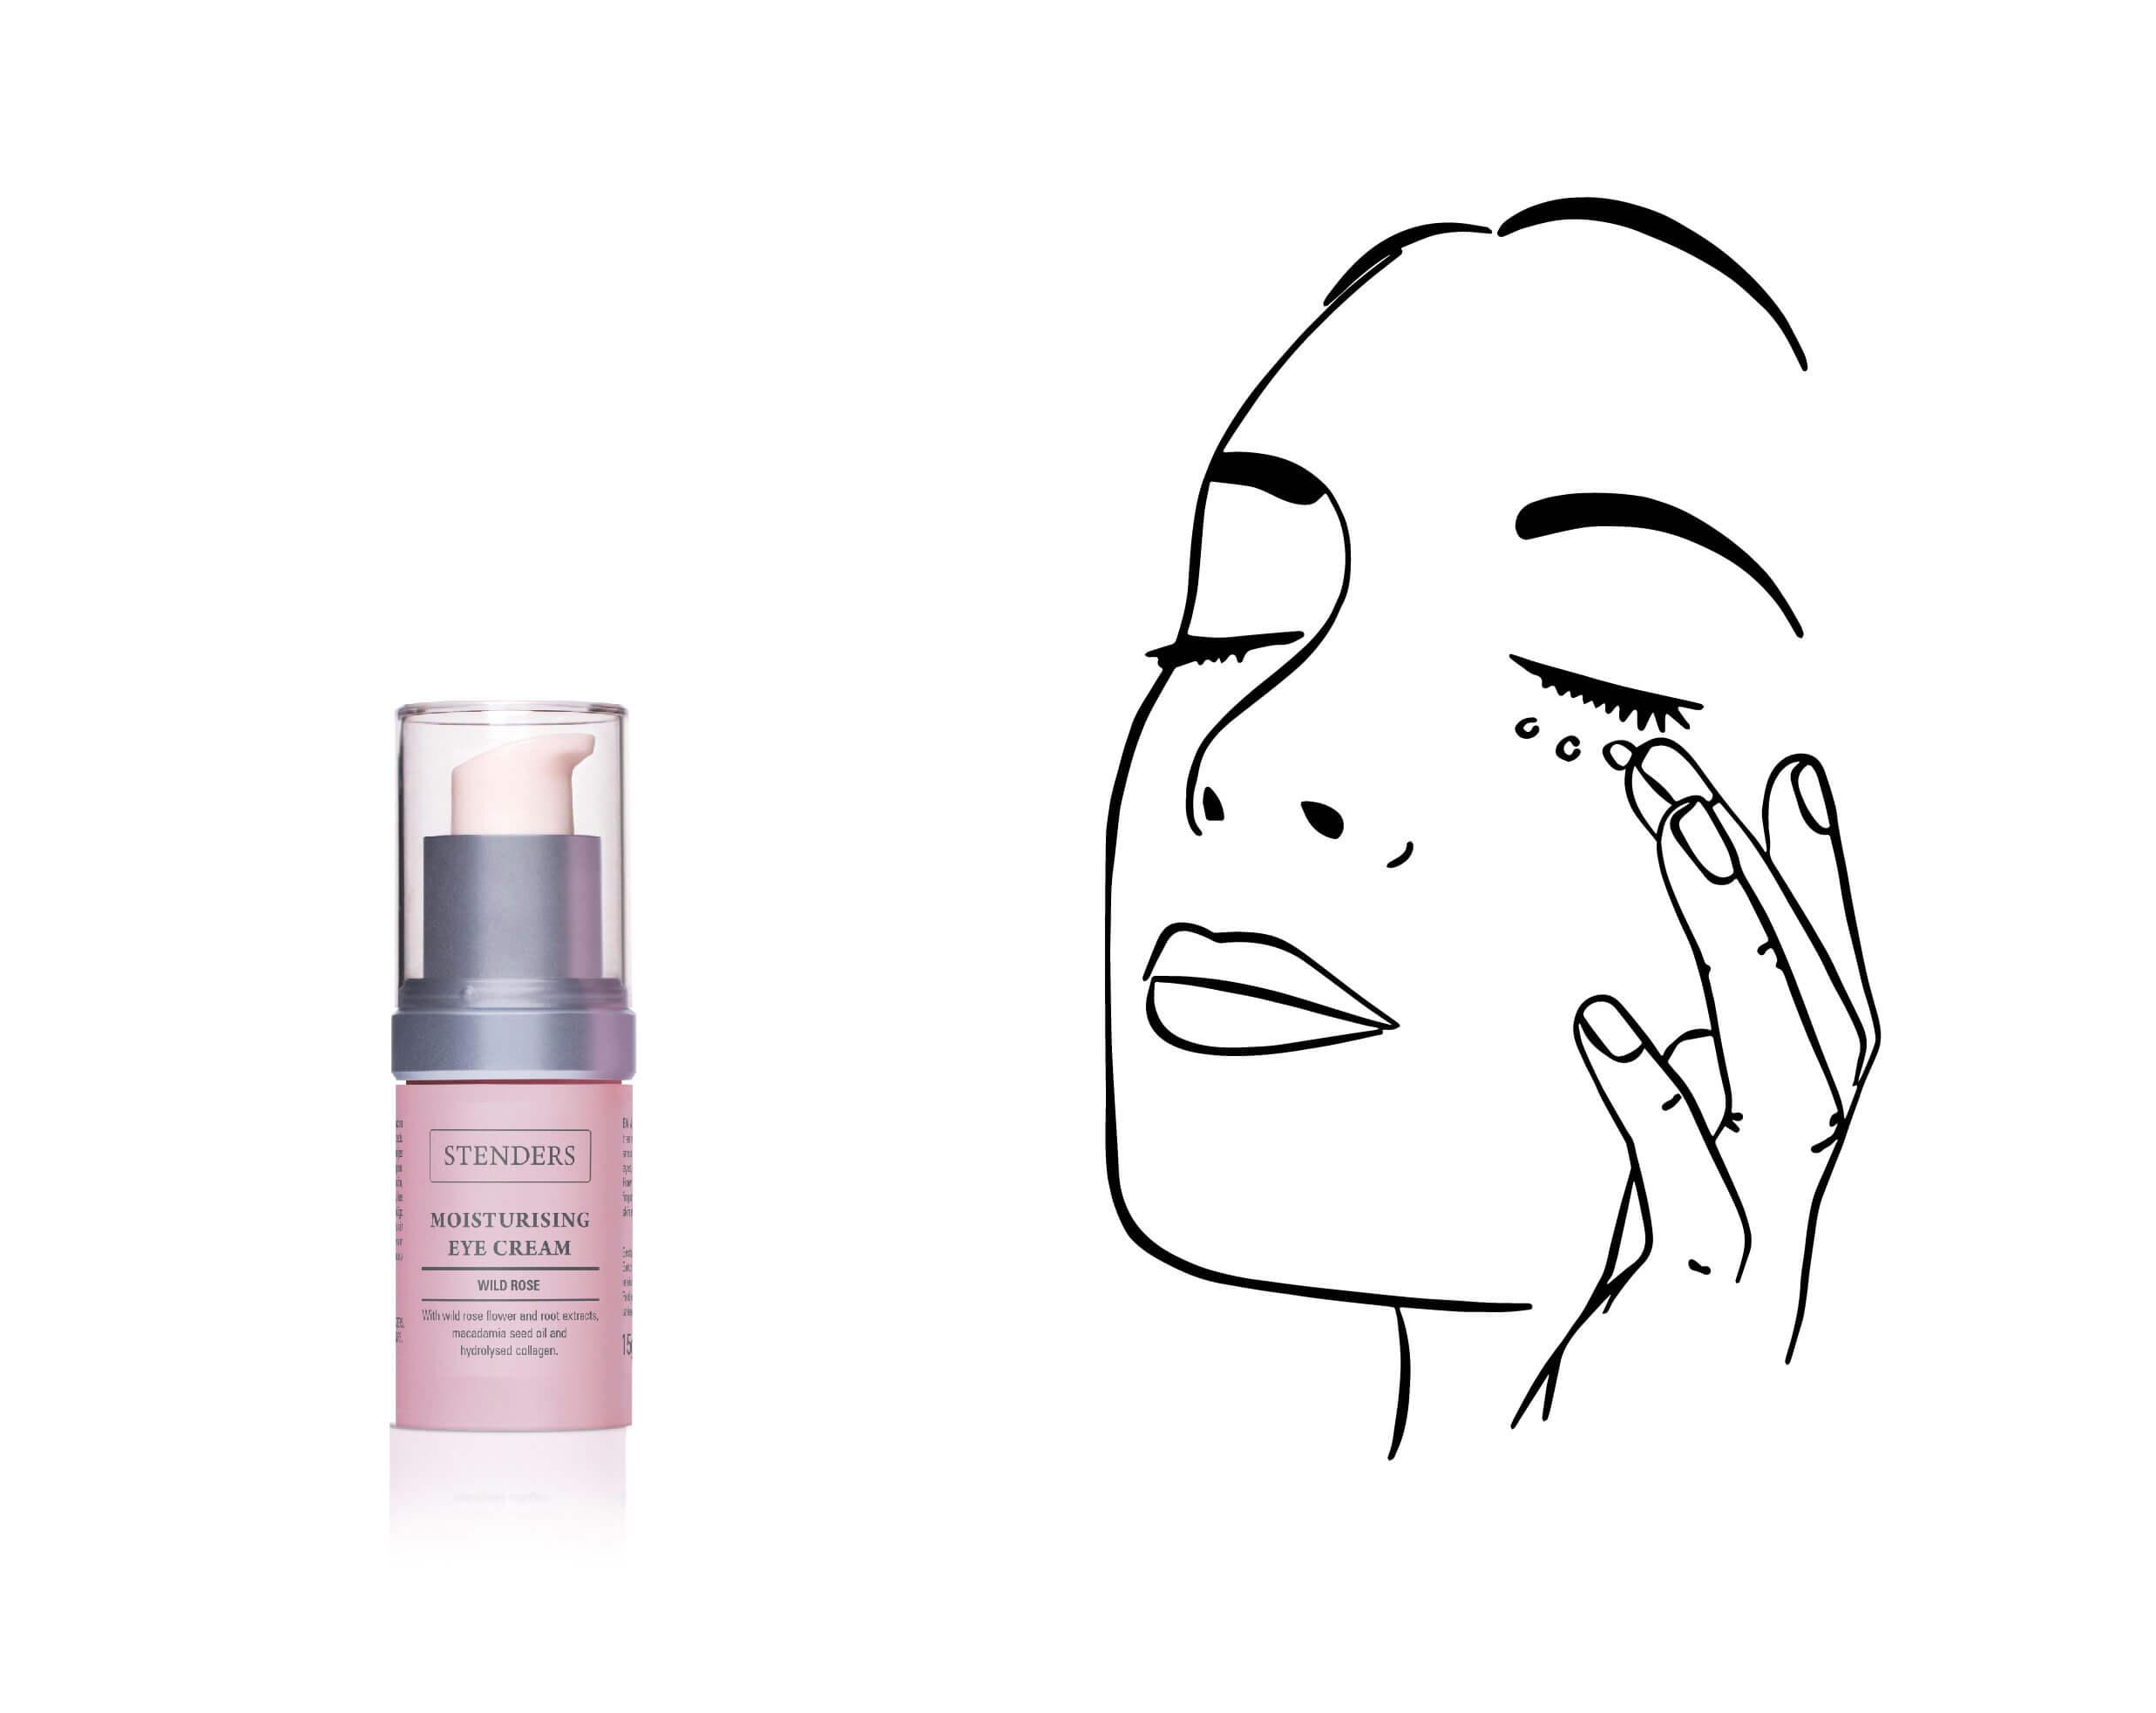 Use Wild Rose Moisturising Eye Cream